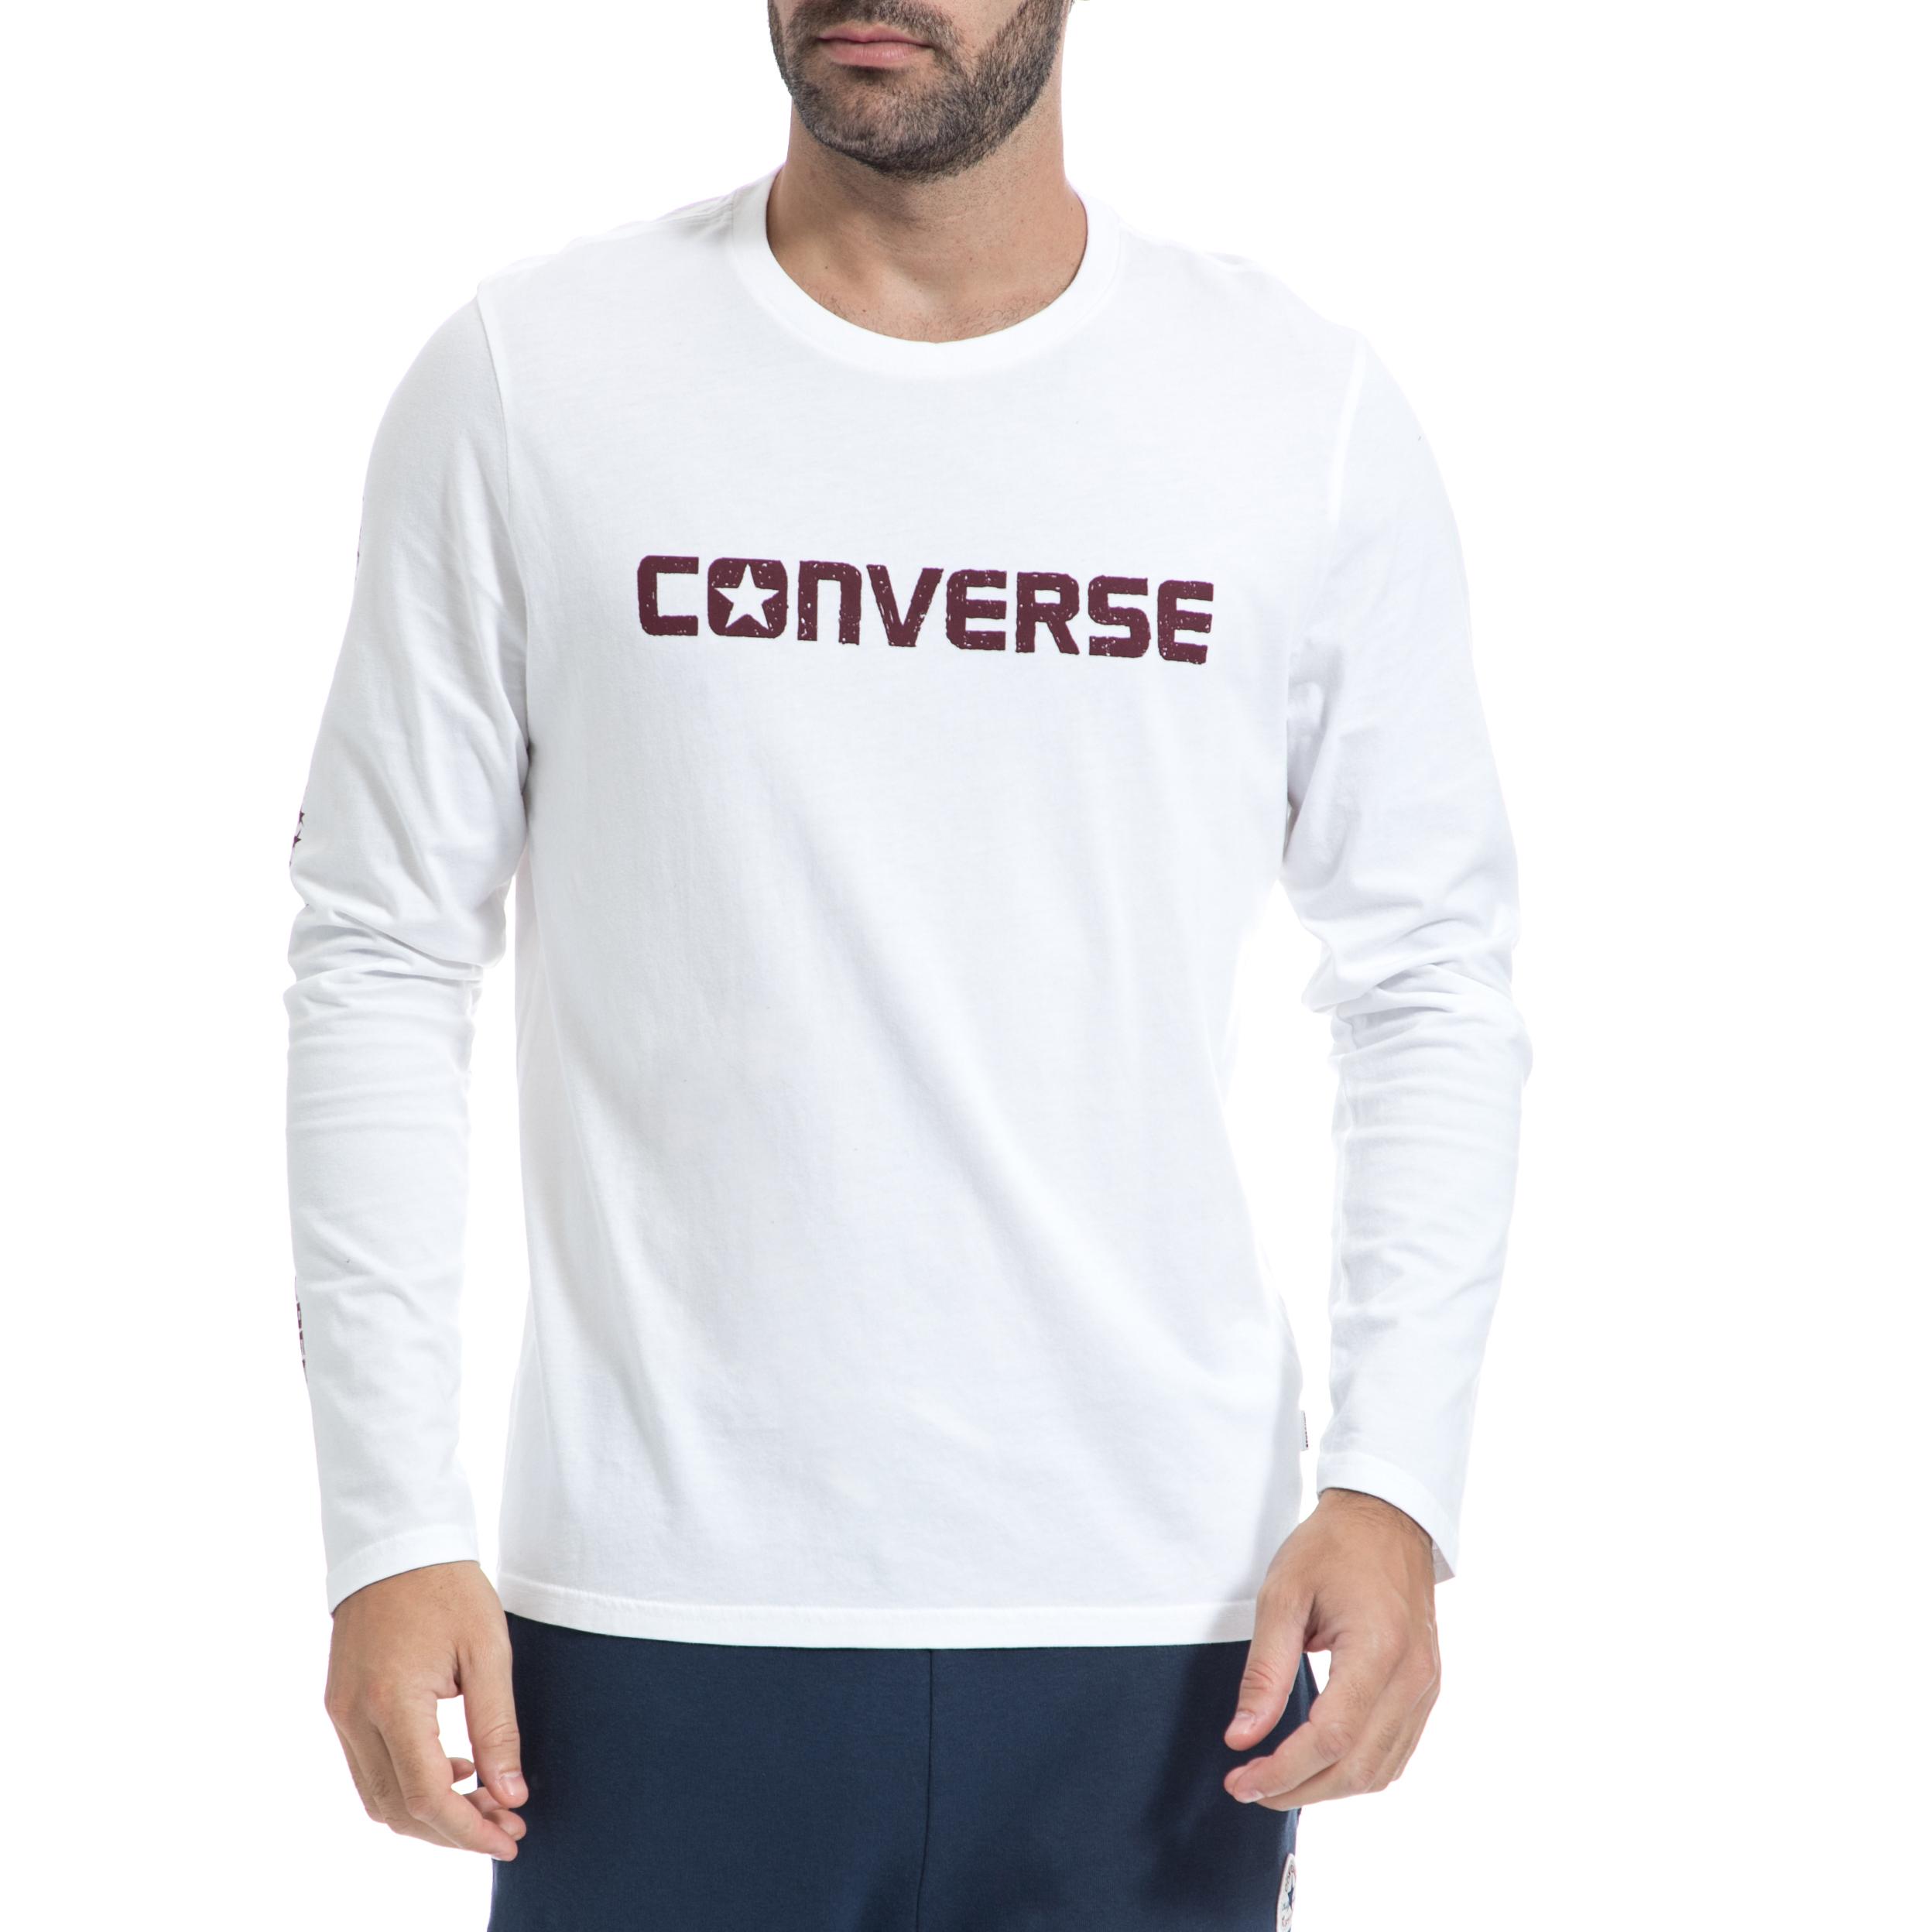 CONVERSE – Ανρική μπλούζα CONVERSE άσπρη